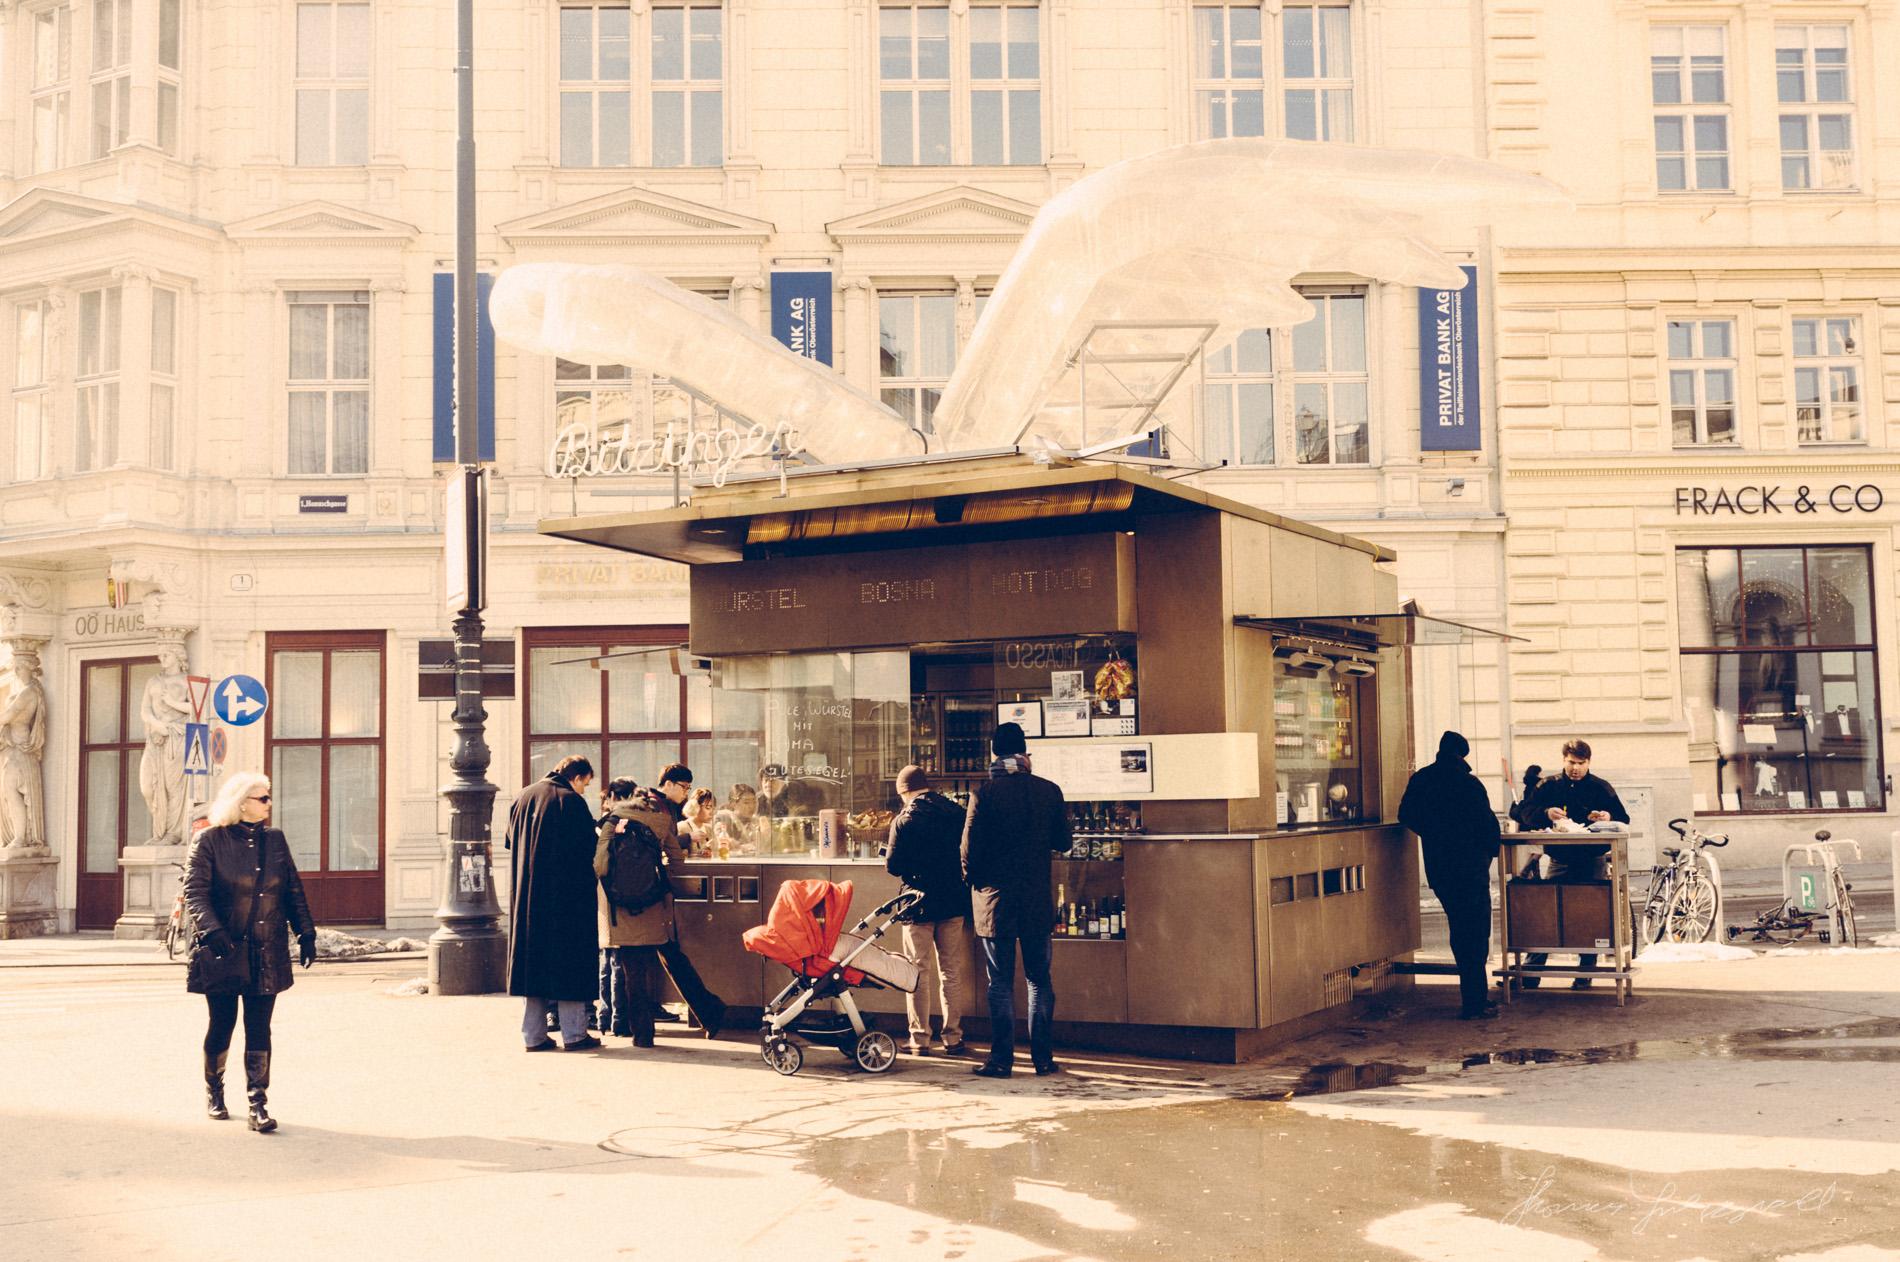 Hot Dog Stand outside the Opera House,  Vienna, Fujifilm X100